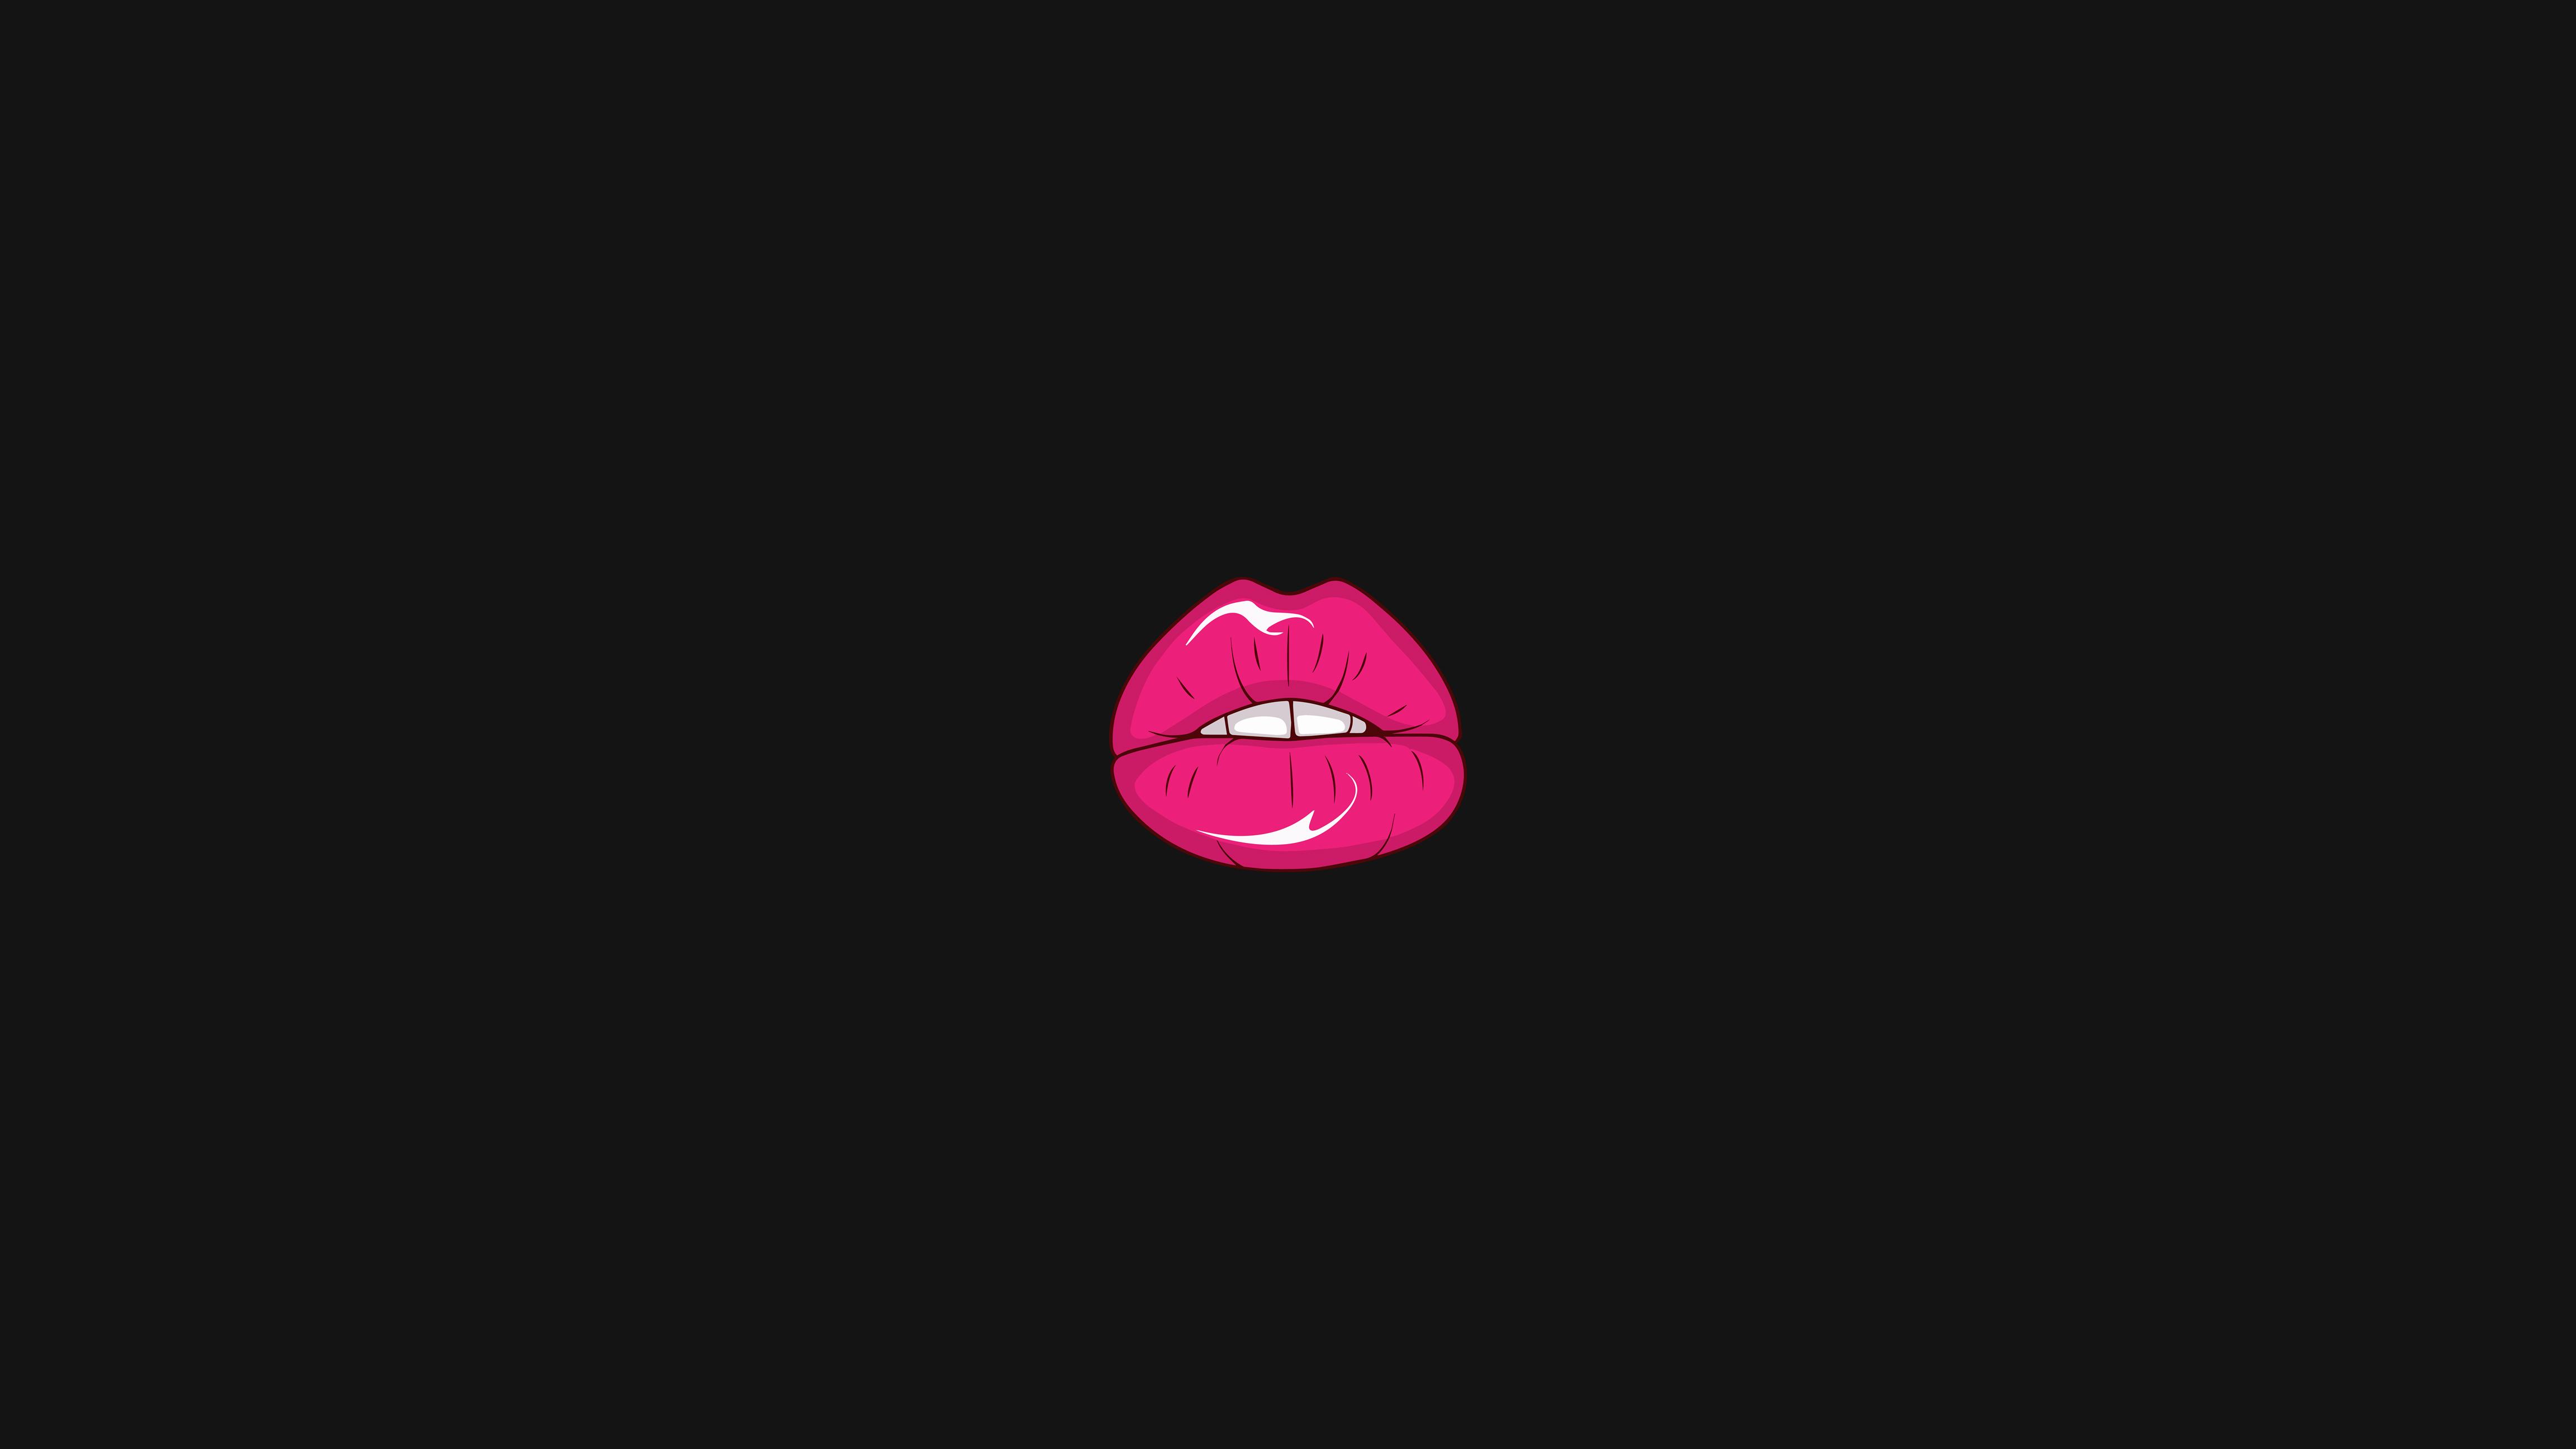 lips minimalist 1574940754 - Lips Minimalist -